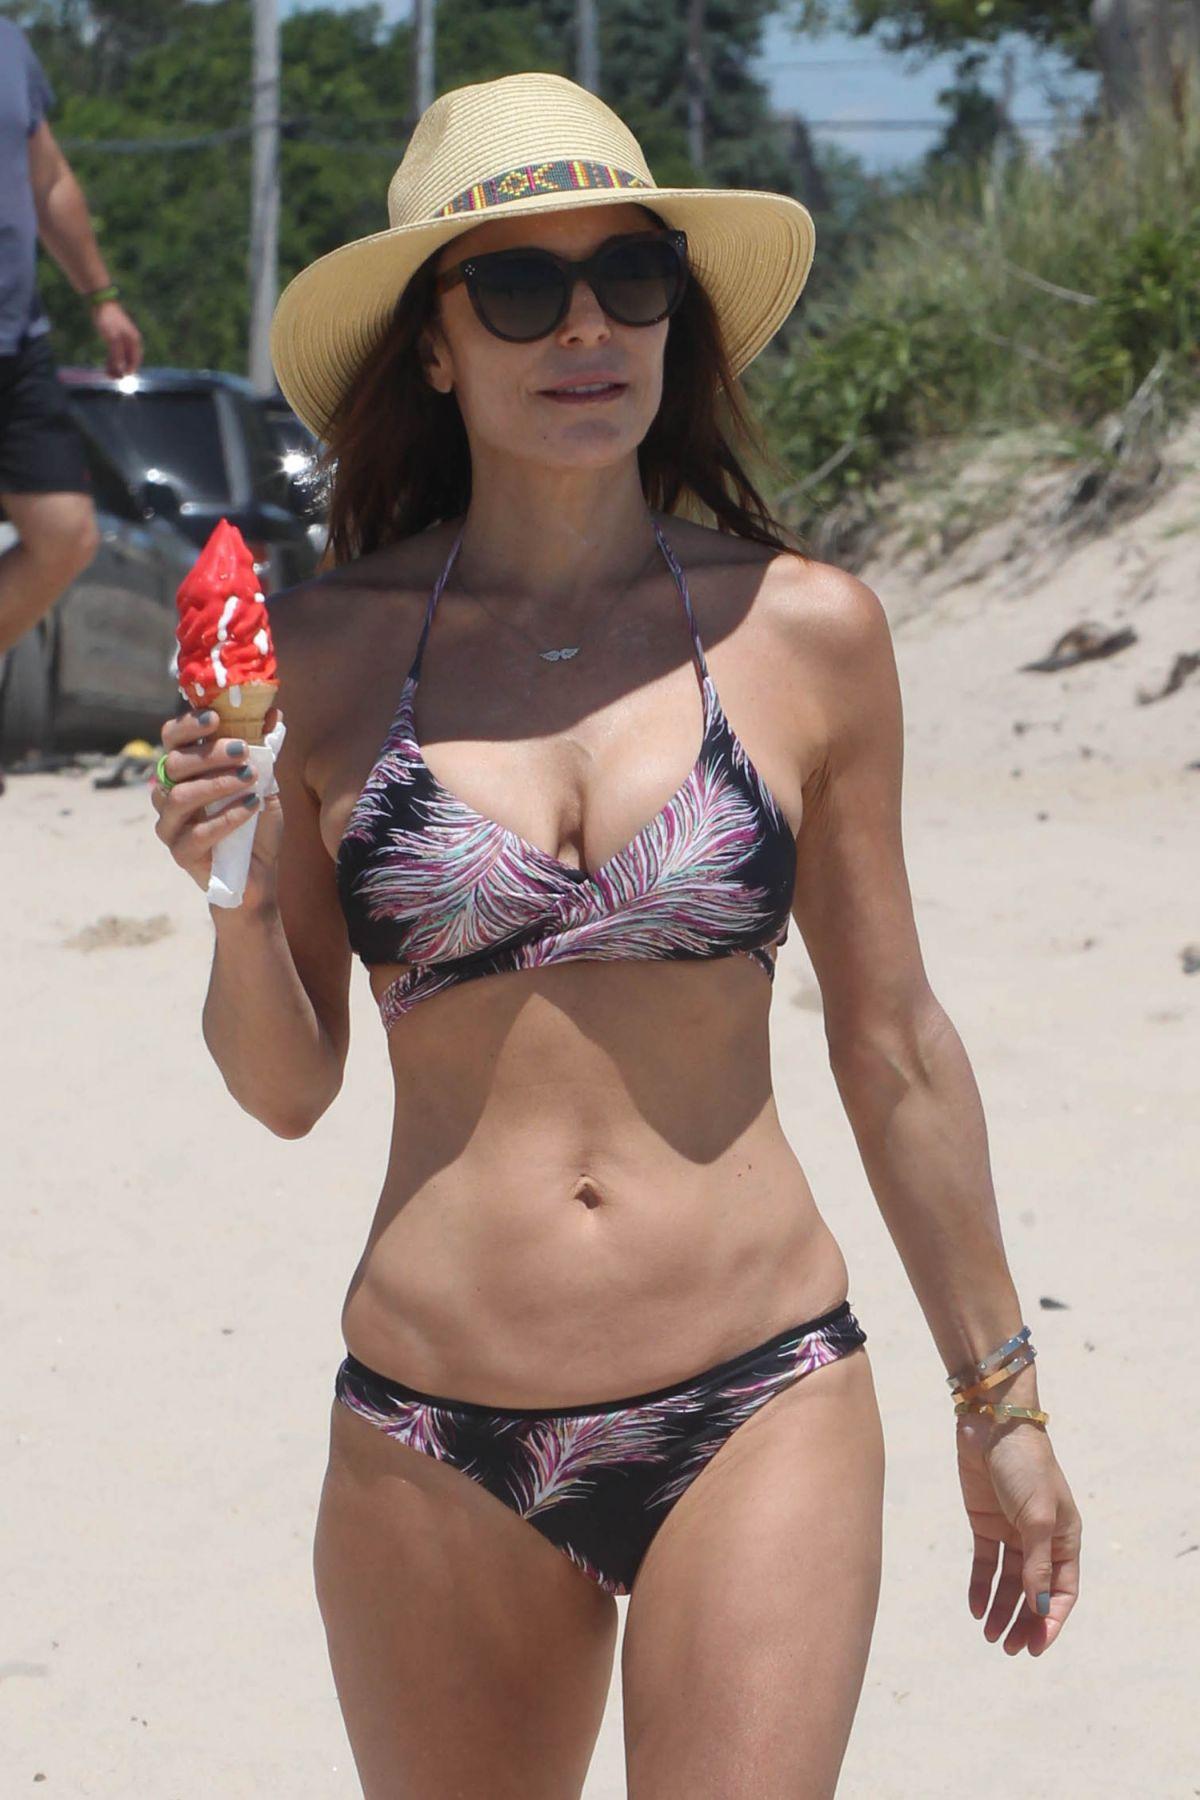 BETHENNY FRANKEL in Bikini at a Beach in Hamptons 06/25/2017